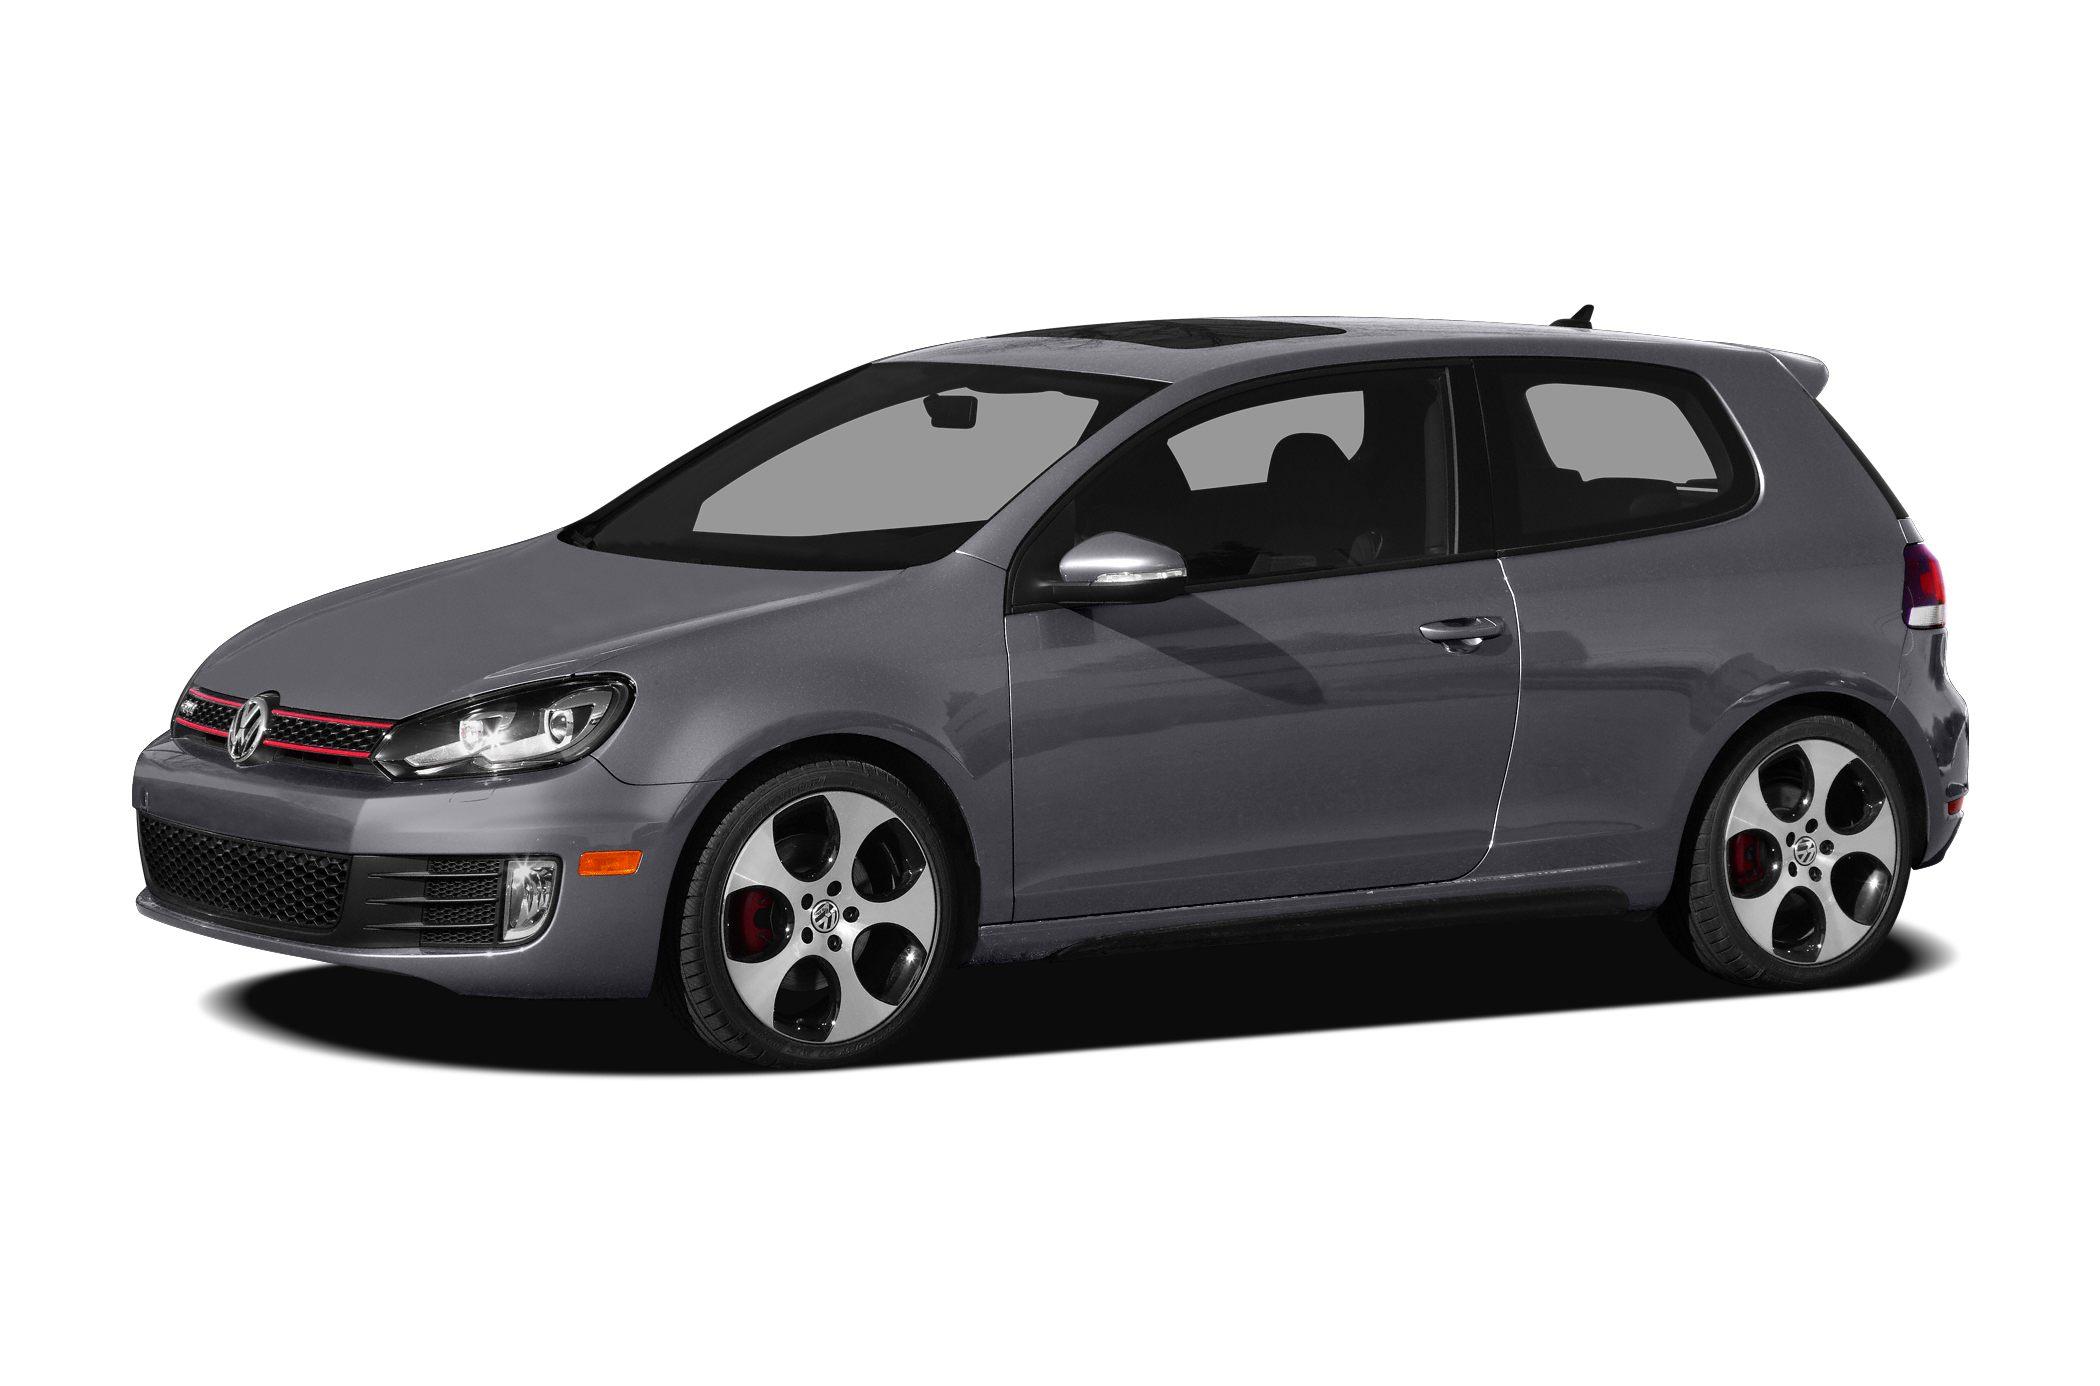 2011 Volkswagen GTI Information